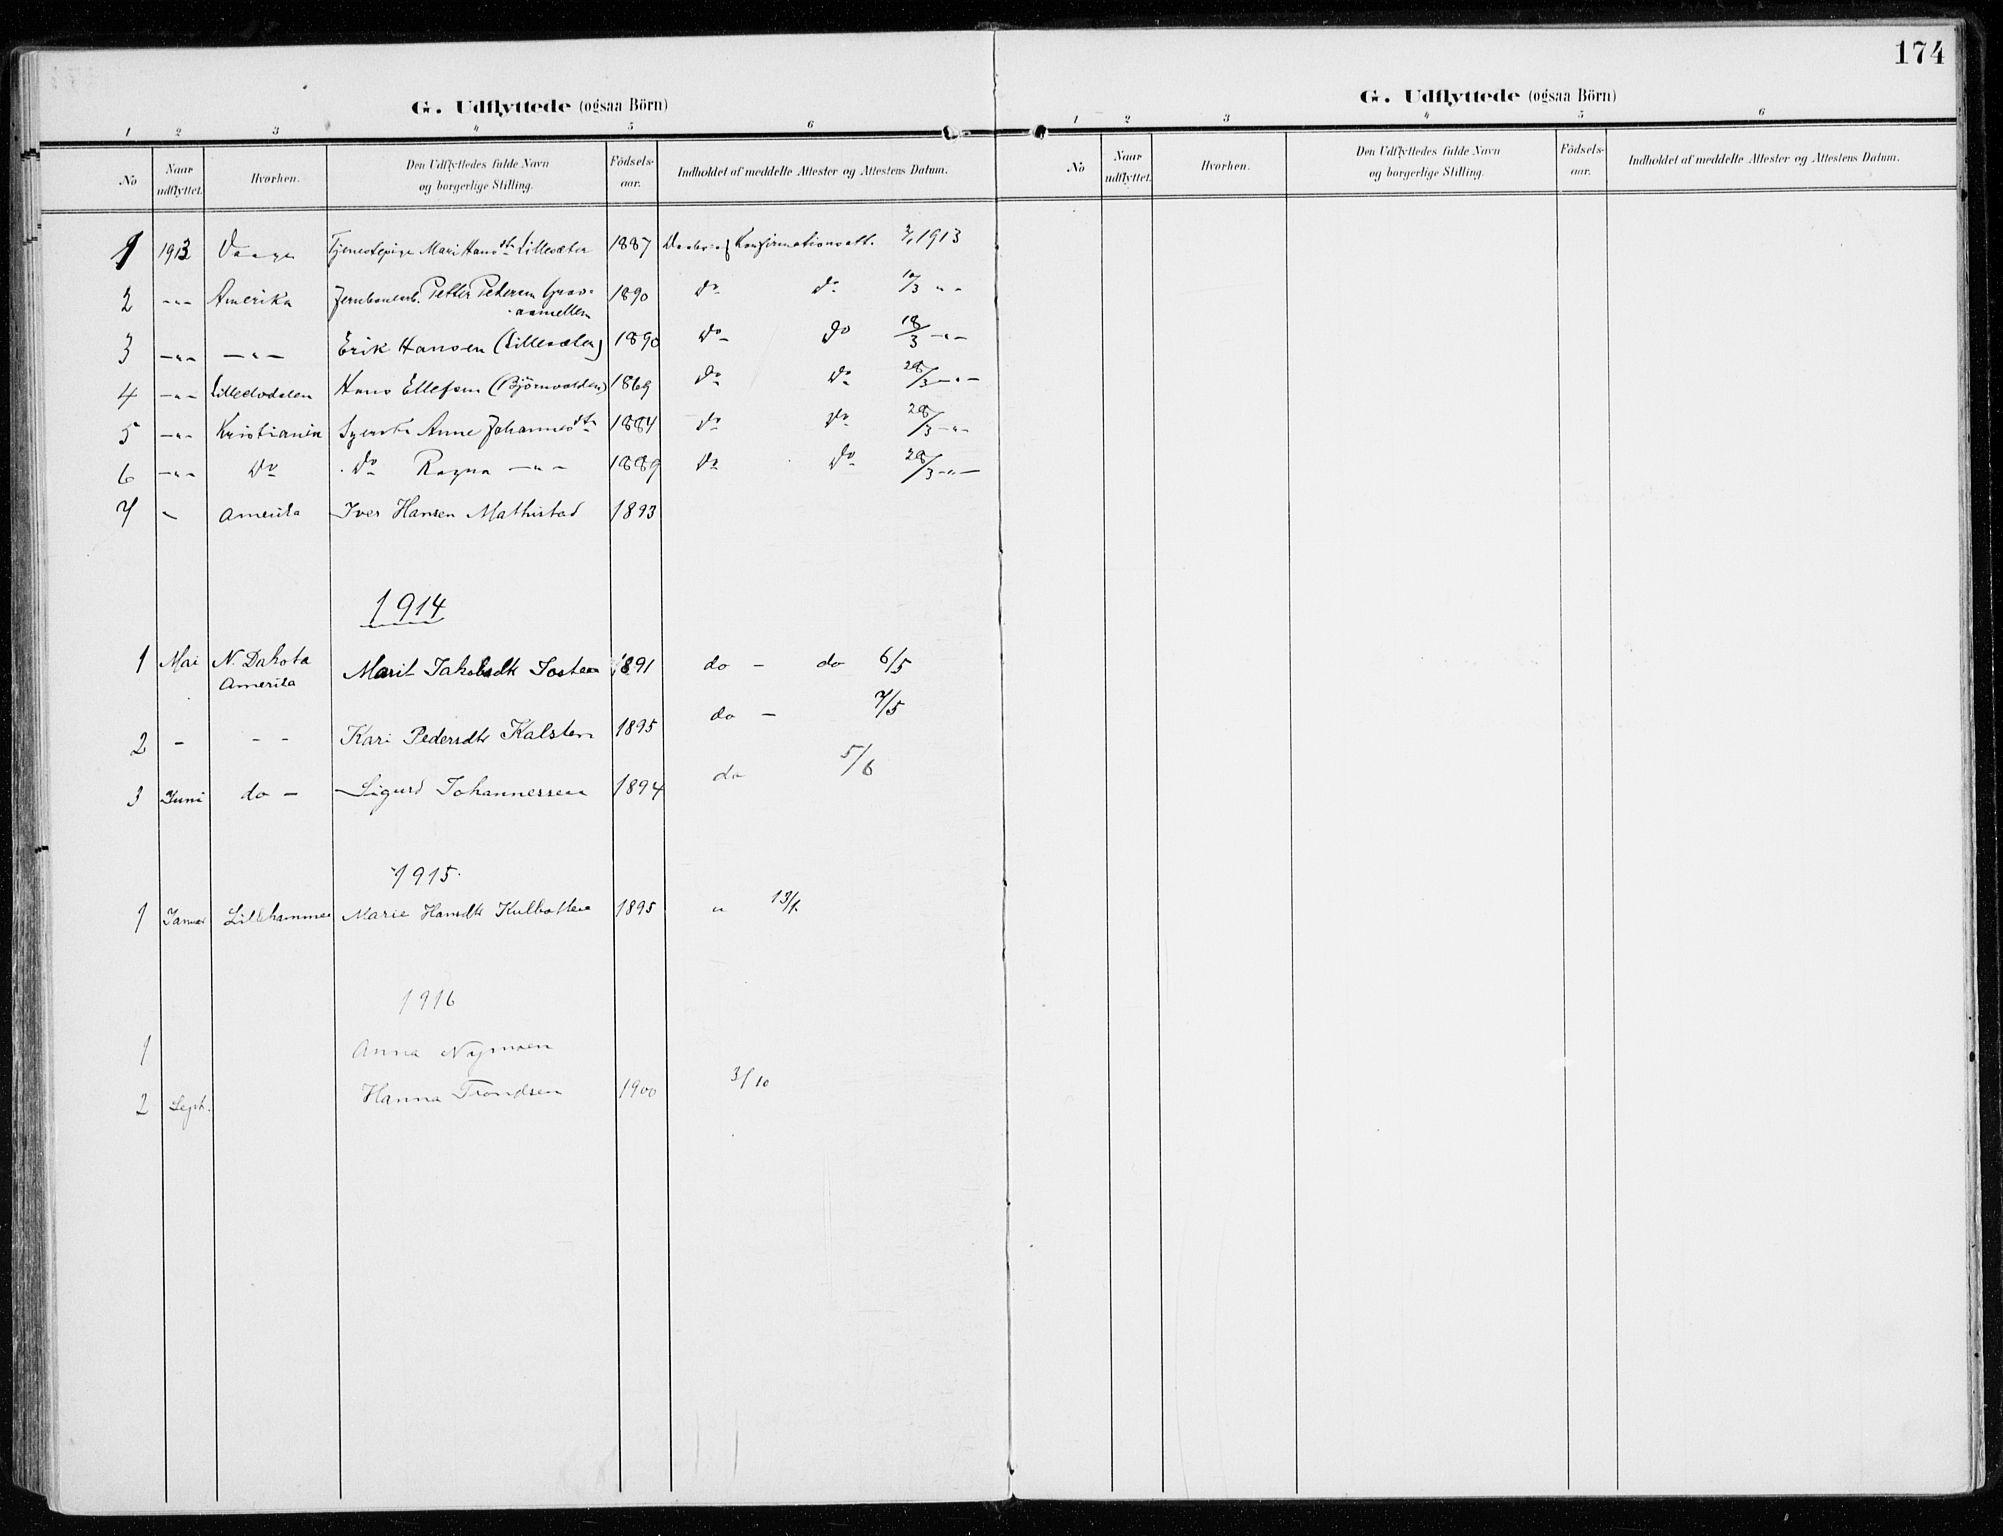 SAH, Sel prestekontor, Ministerialbok nr. 2, 1905-1919, s. 174